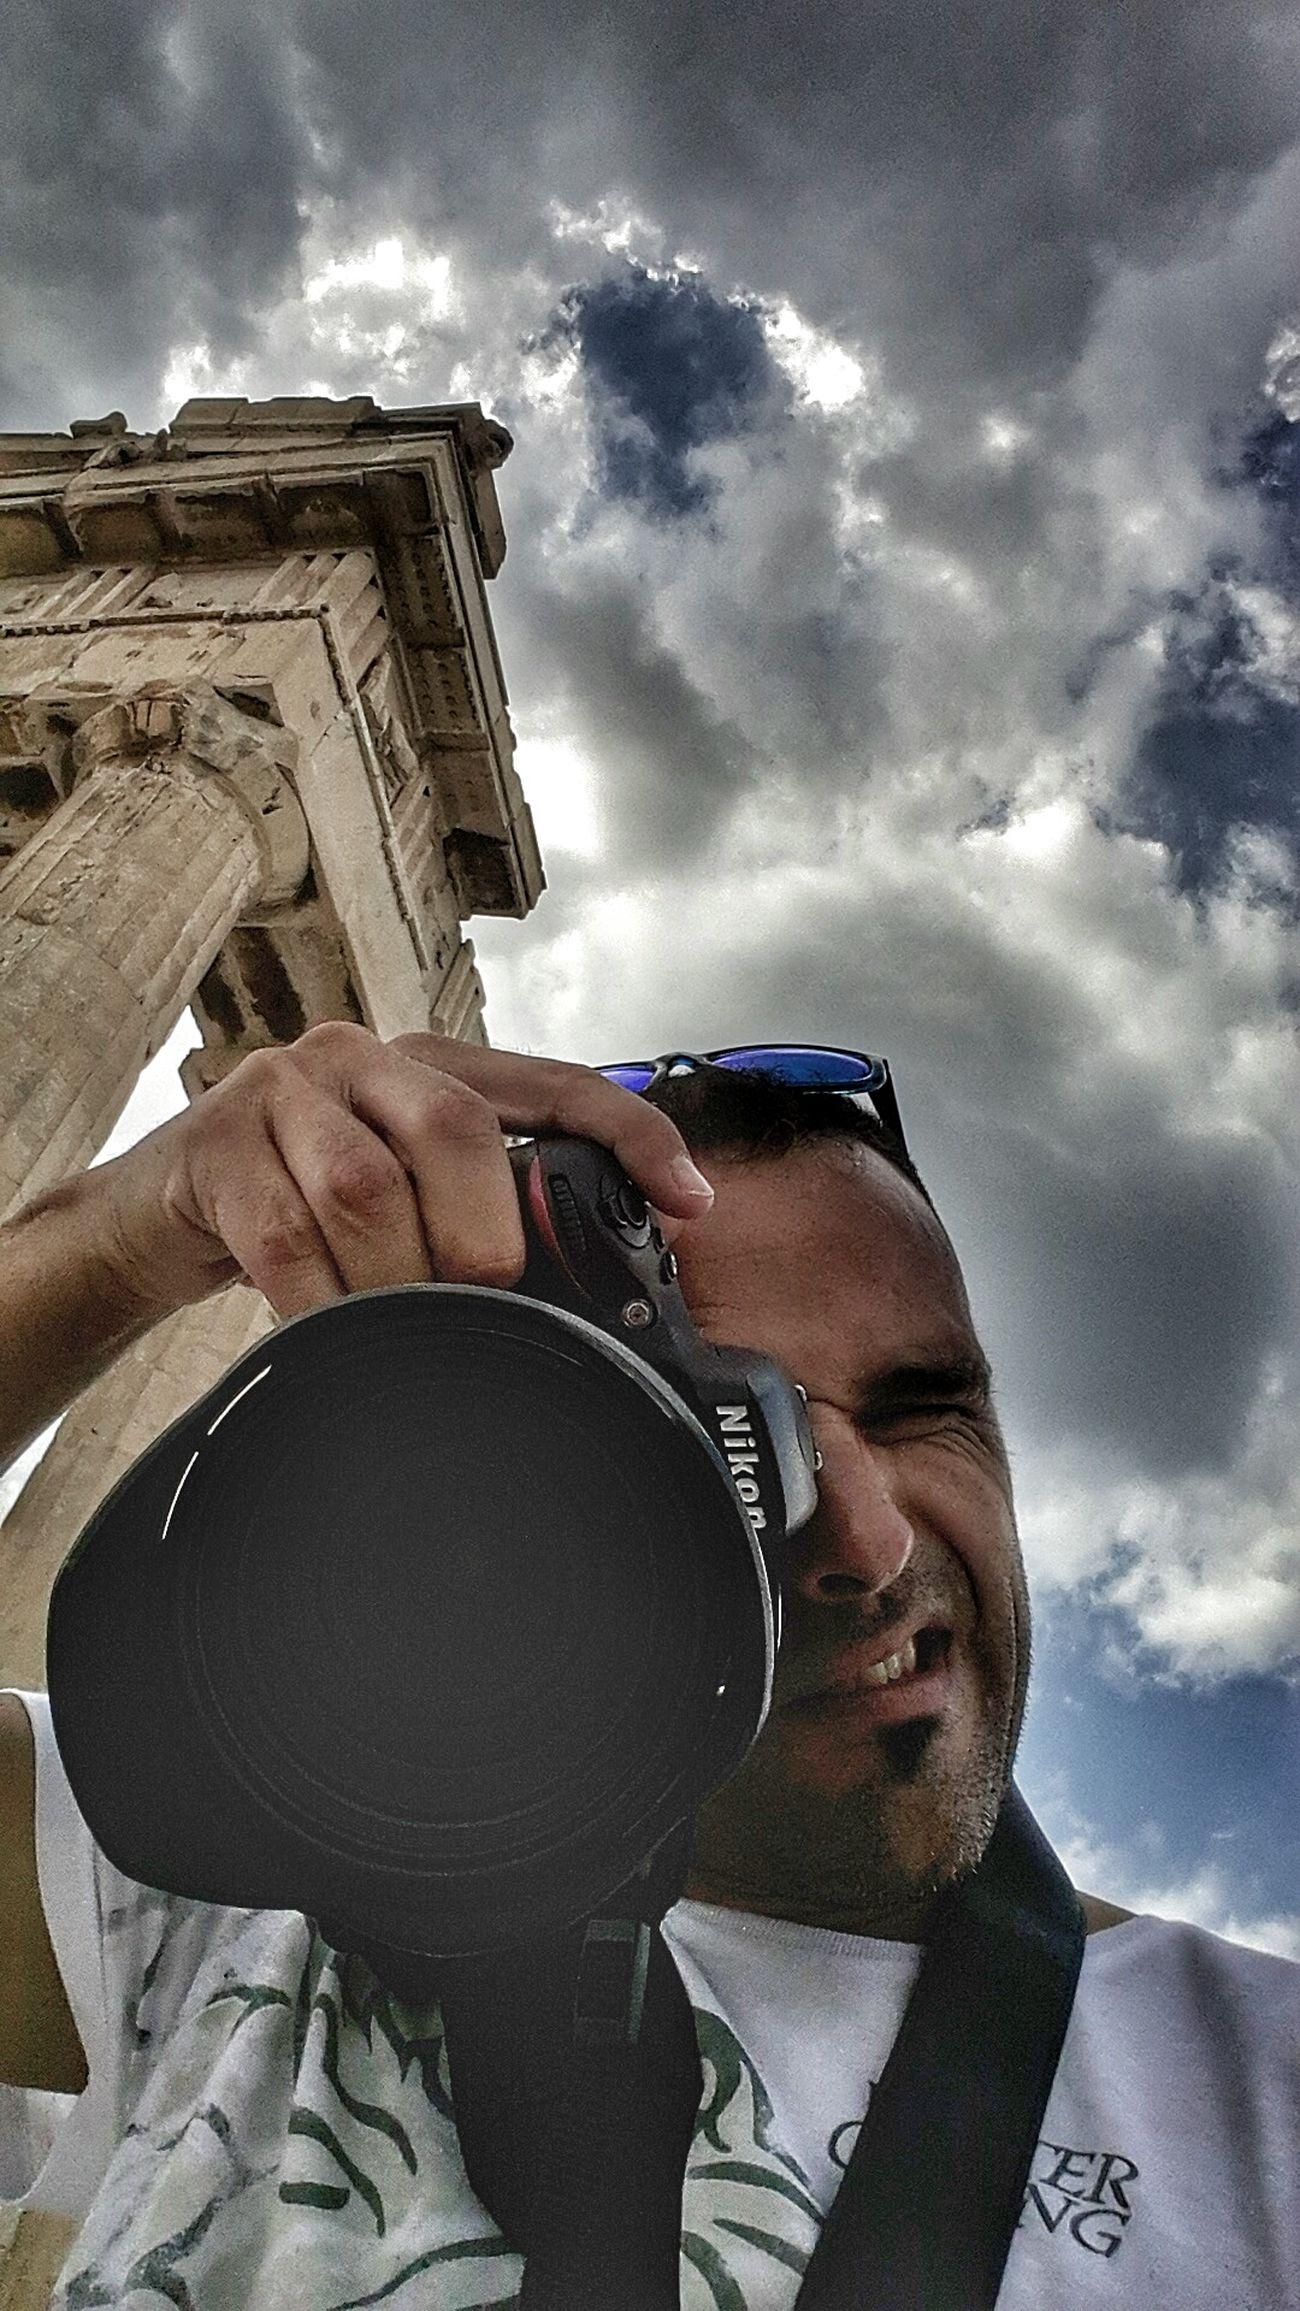 Acrópolis (Atenas) Portrait Picoftheday That's Me Greece Parthenon Acropolis Greece Art Nikon D610 EyeEm Best Shots - People + Portrait Summer2016 Athens, Greece Eyemphotography Sky And Clouds Snapseed Popular Photos Traveling Hi!